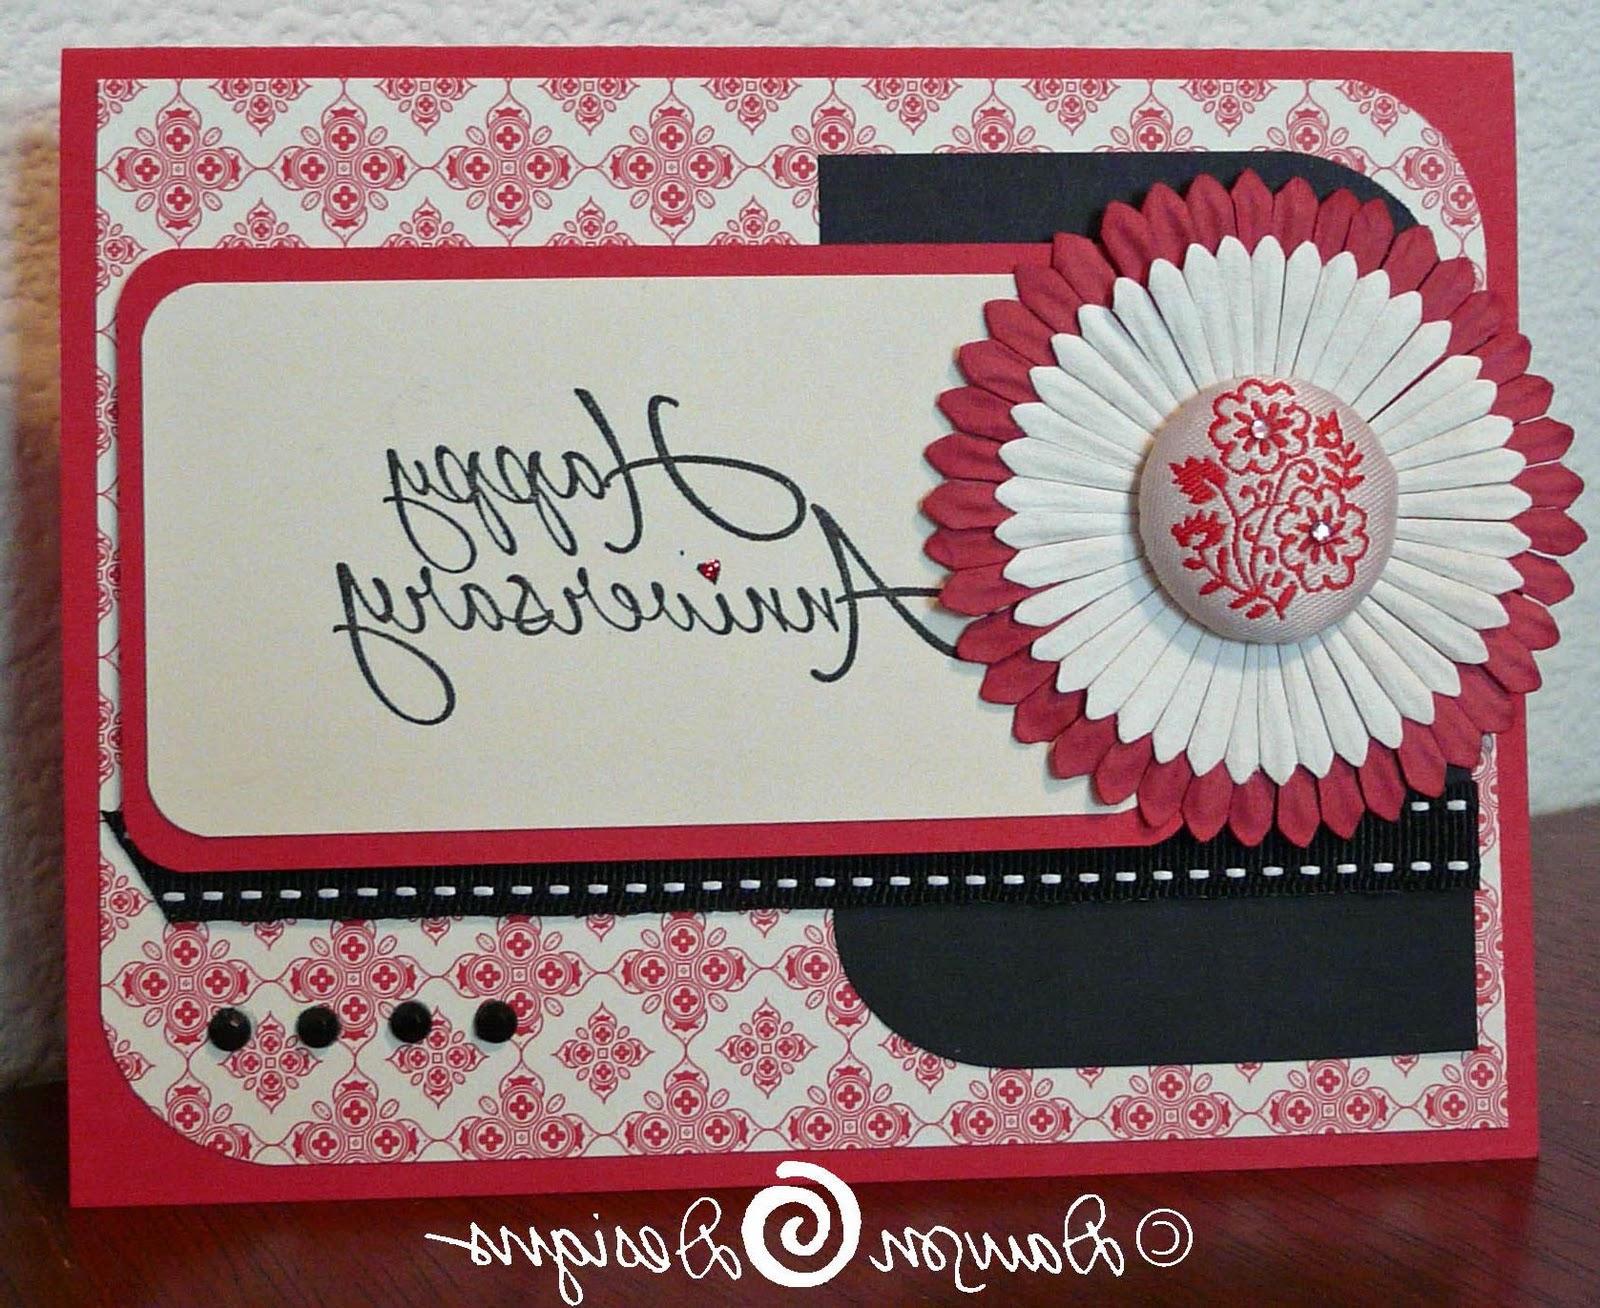 Anniversary Card 12-13-10